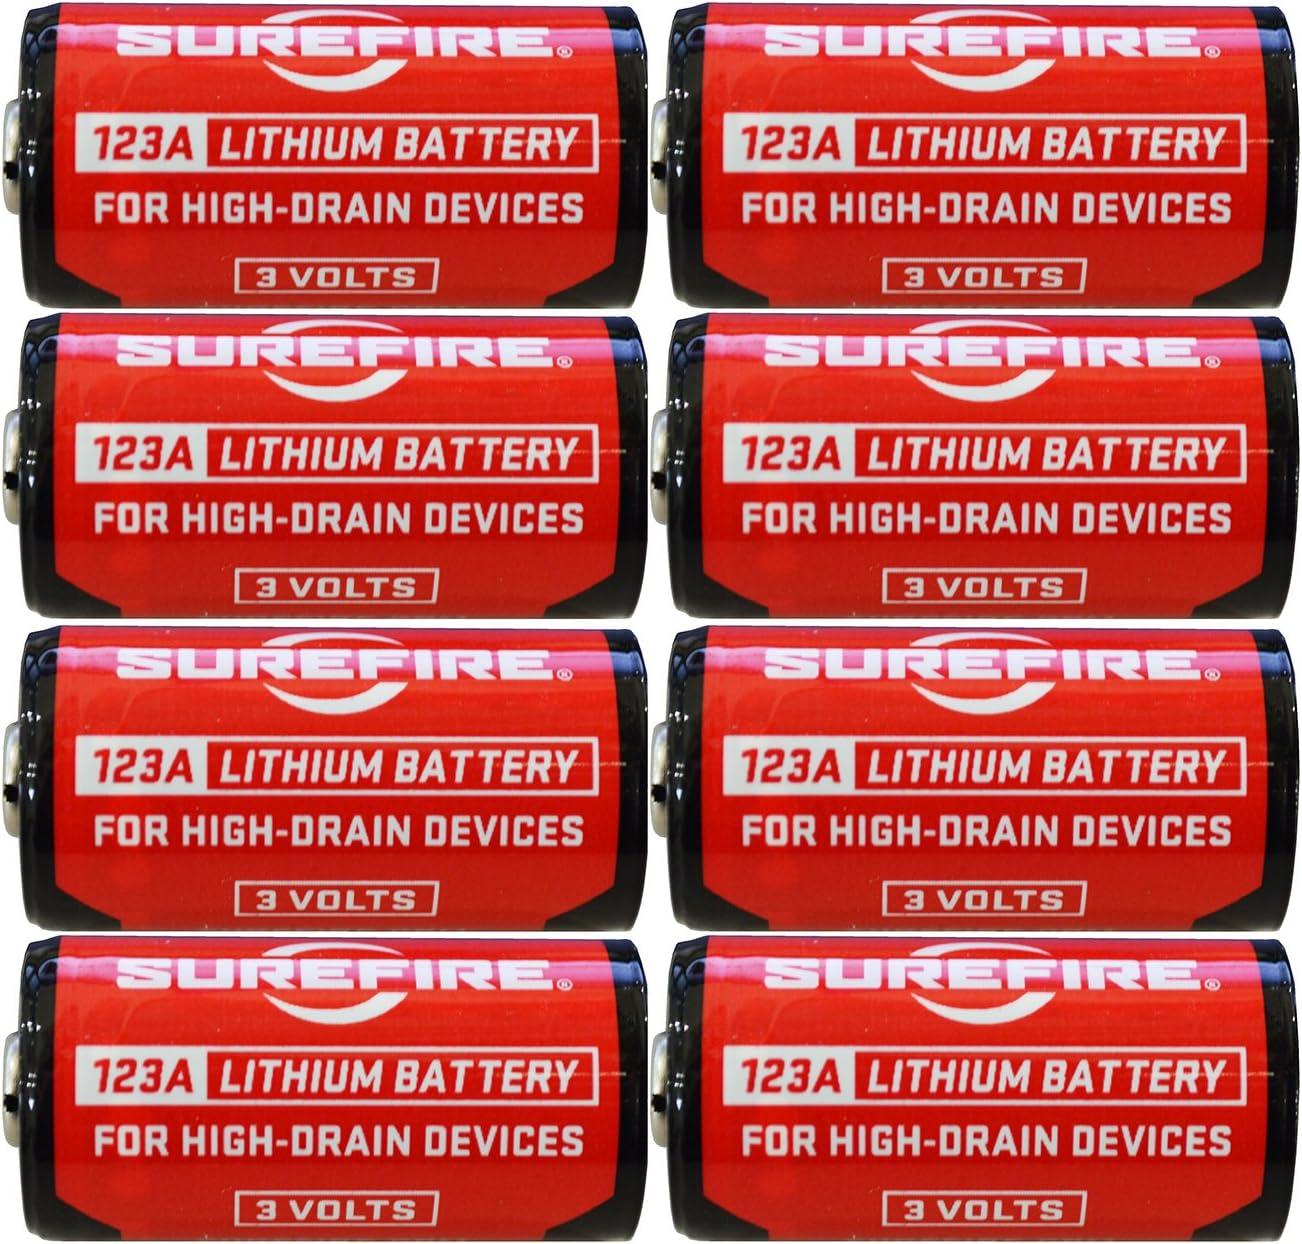 Surefire SF123A 123A 3-Volt Lithium Batteries 8 Pack EXP in Feb 2029